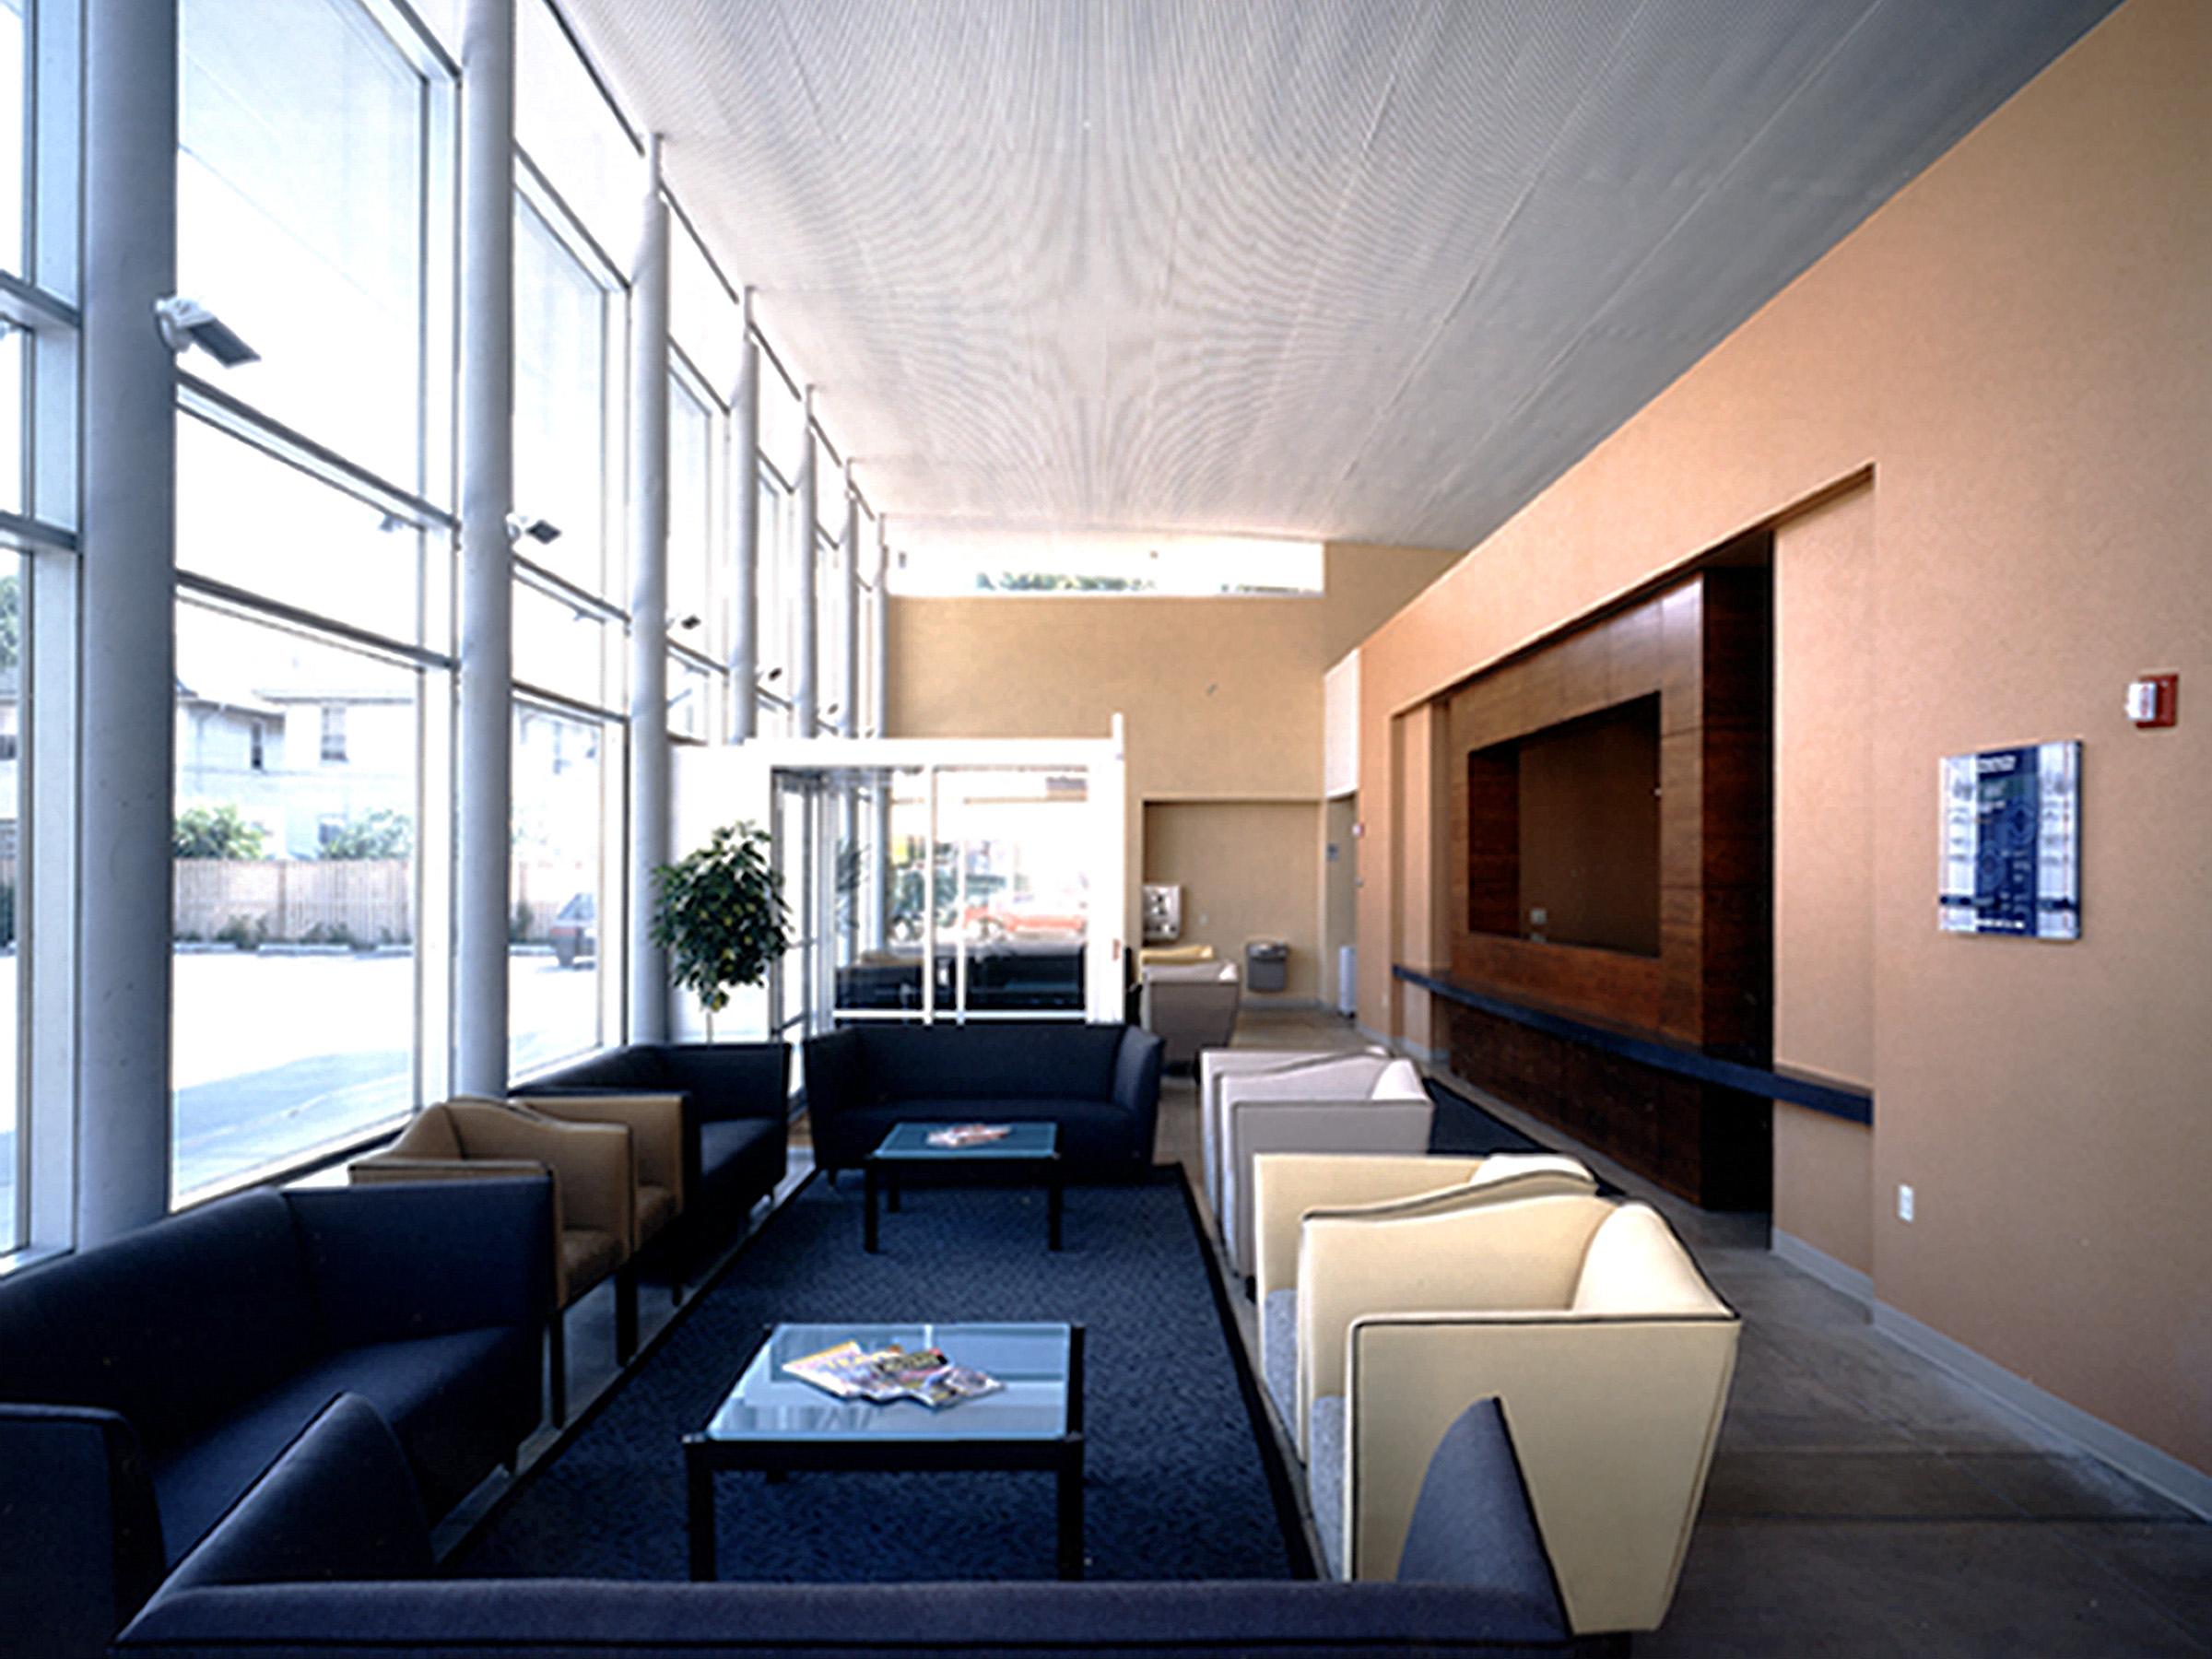 9605 - Interior View 3 - Waiting Lounge.jpg